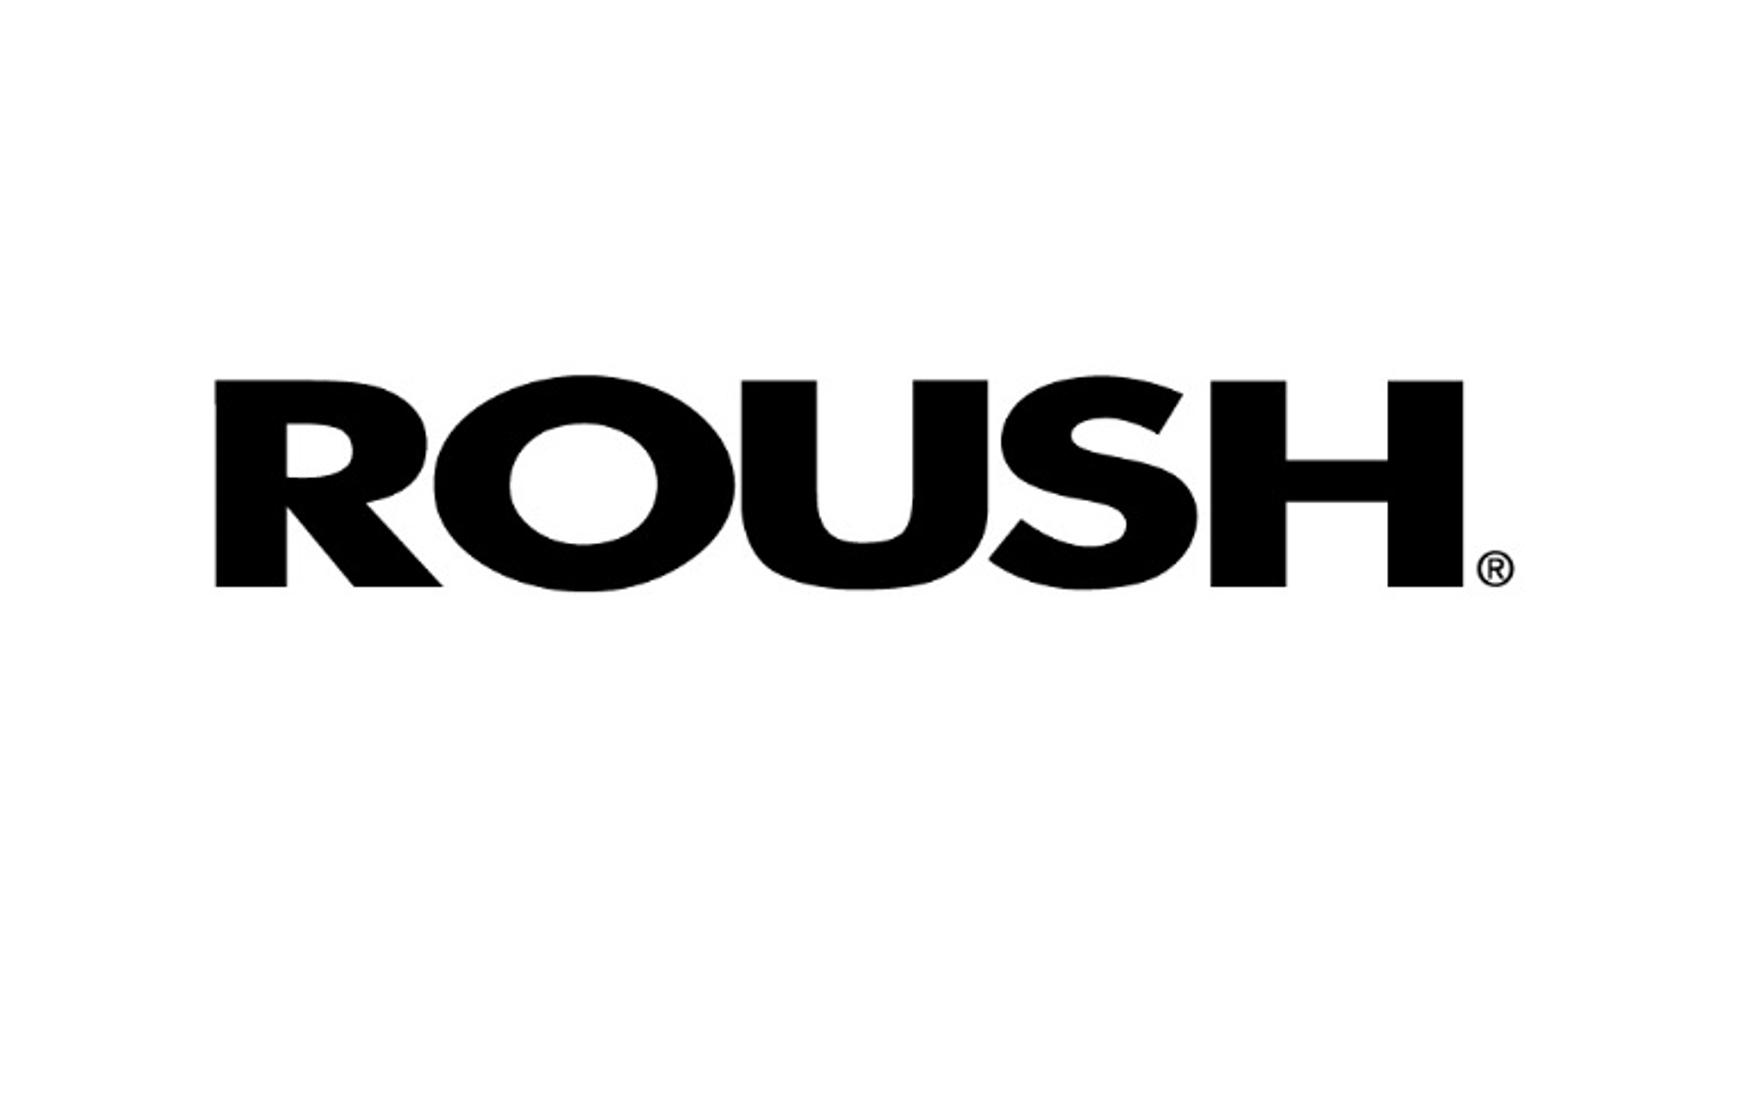 RoushLogoSilverGold.png